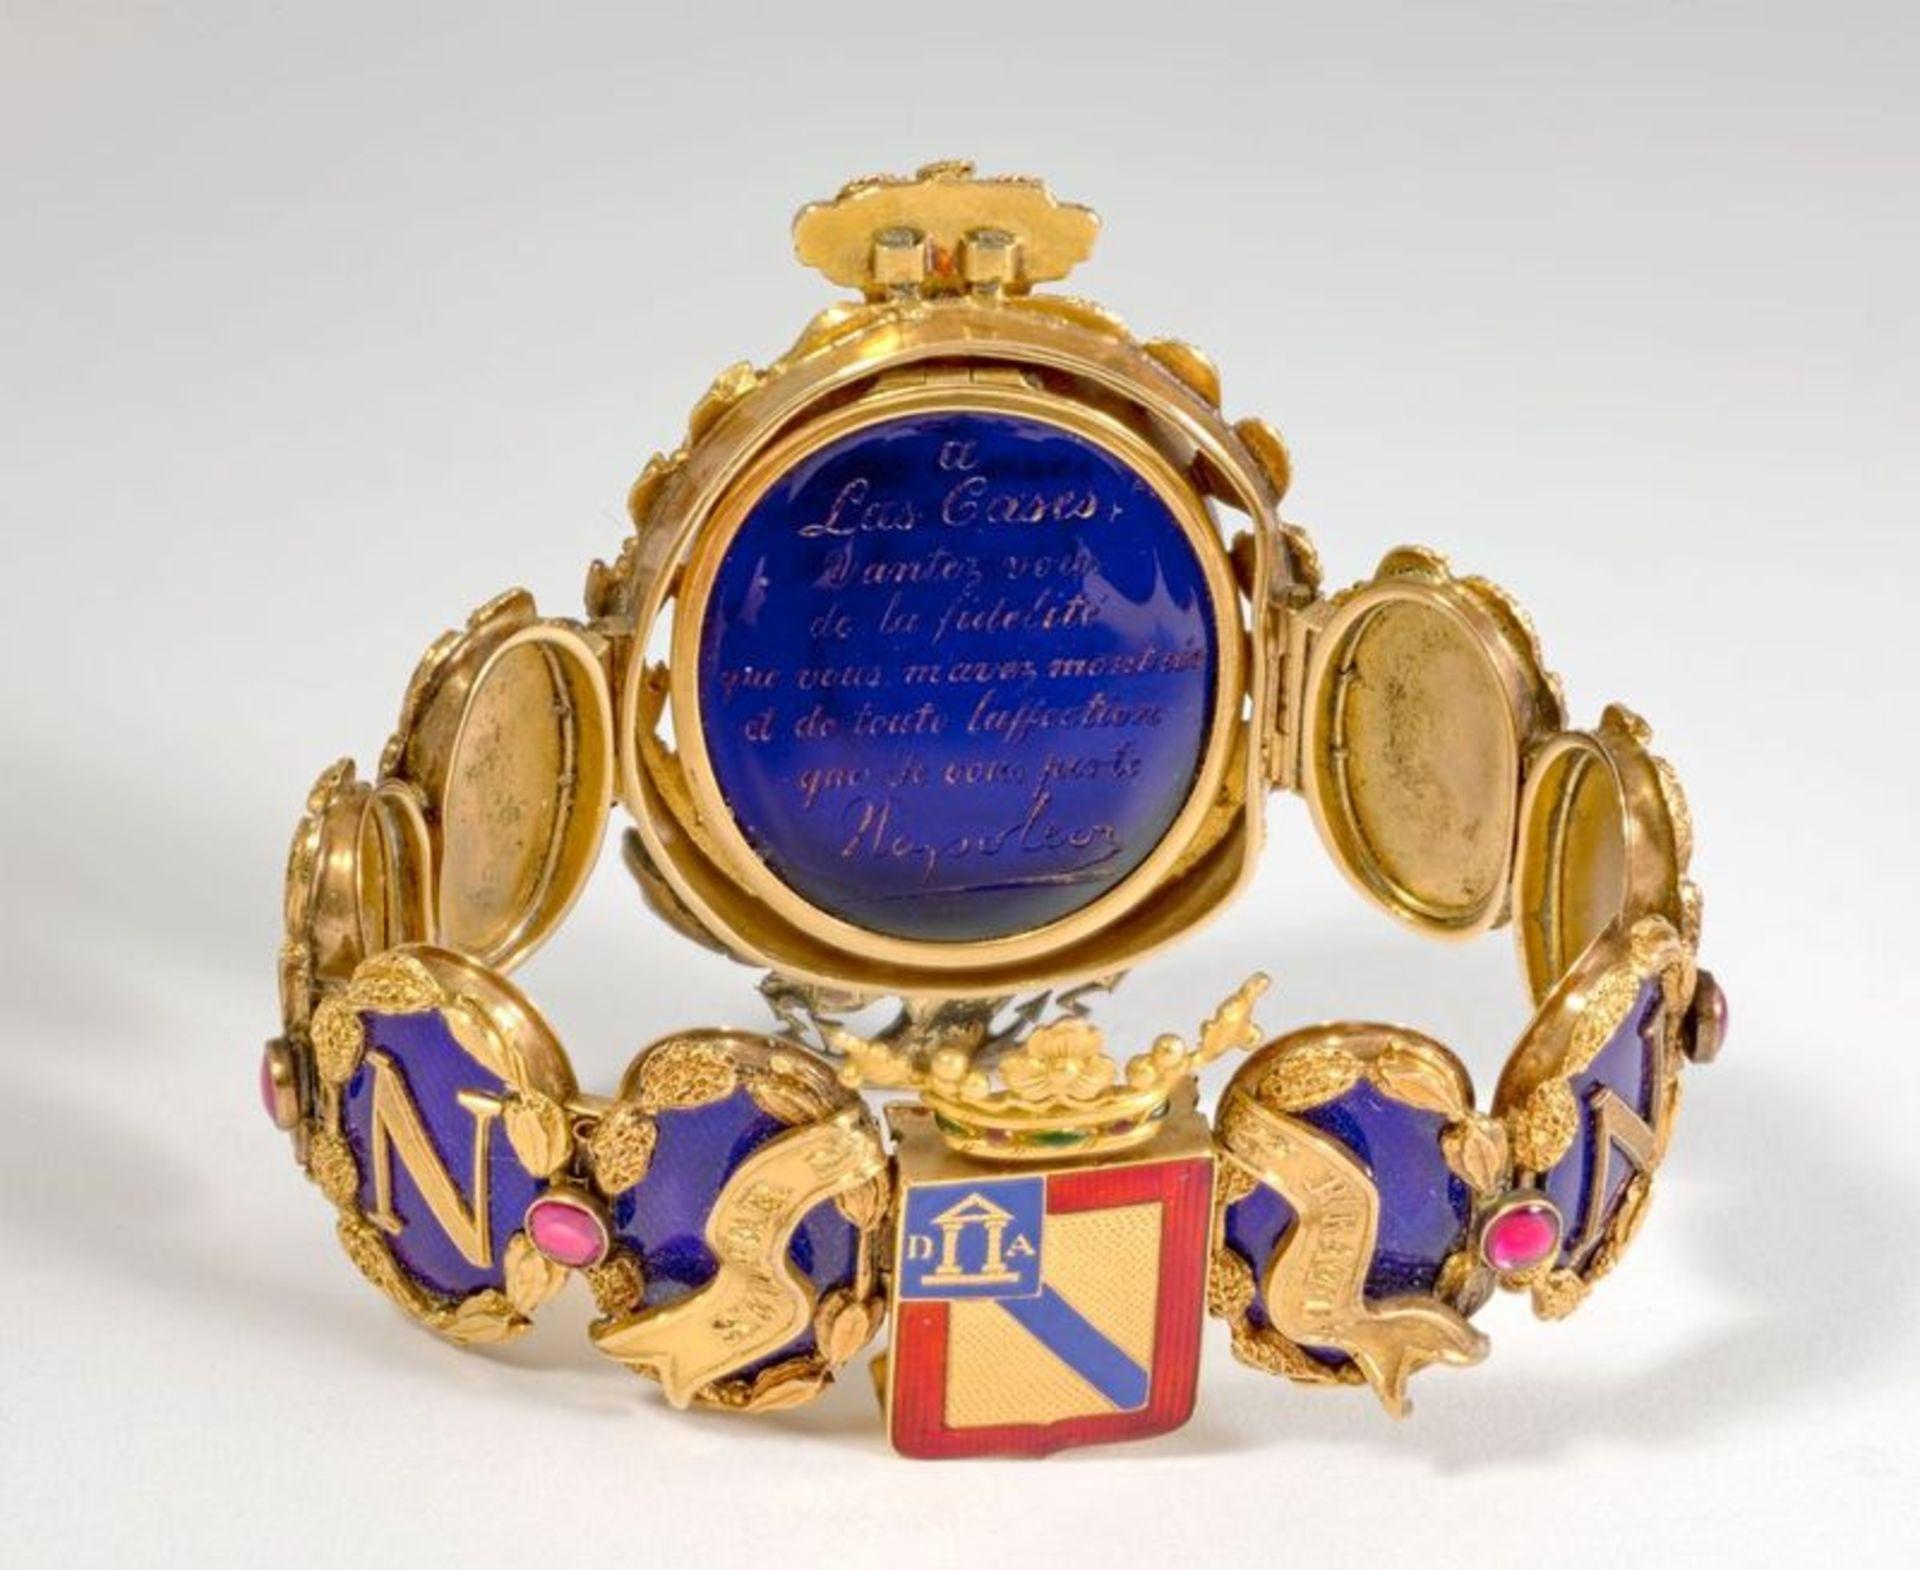 NAPOLEON PRESENTATION BRACELET TO LAS CASES UNIQUE GOLD, BLUE ENAMEL AND GEMSTONE [...] - Bild 2 aus 3